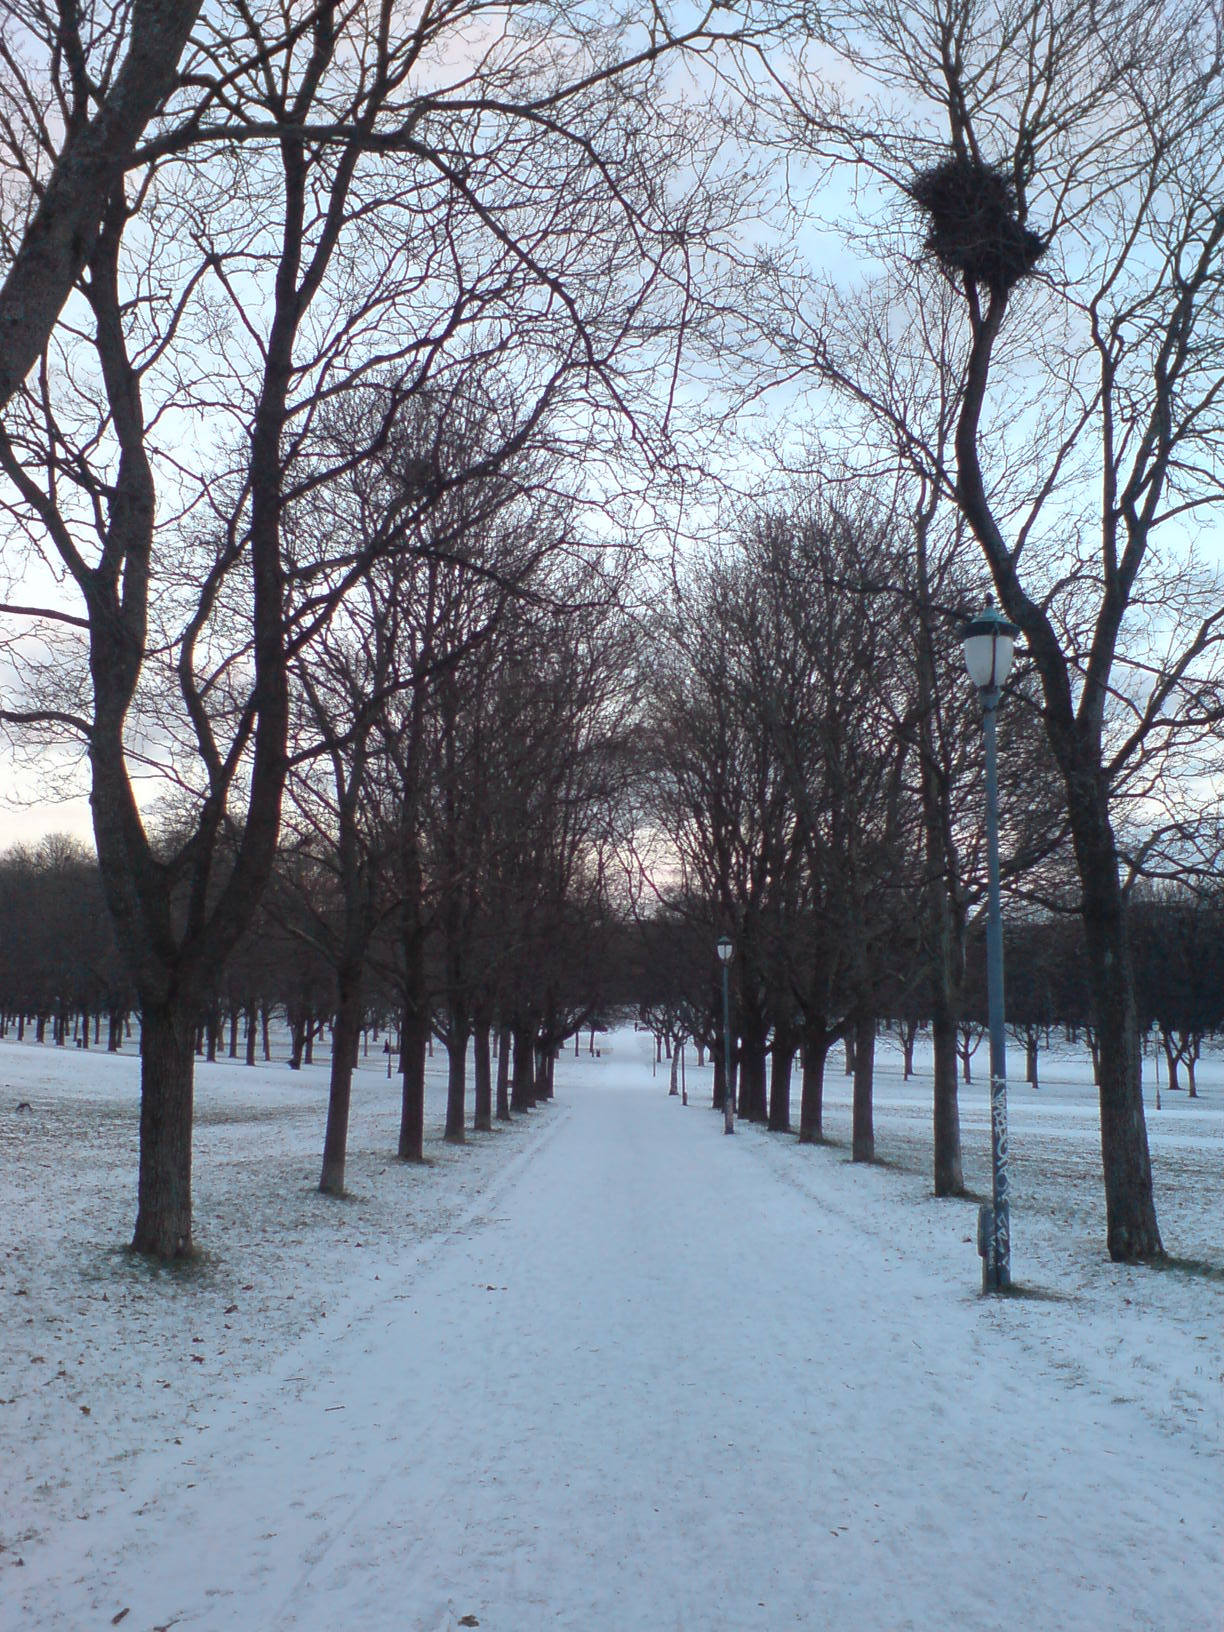 First snow in Oslo - Winter Photo (603766) - Fanpop